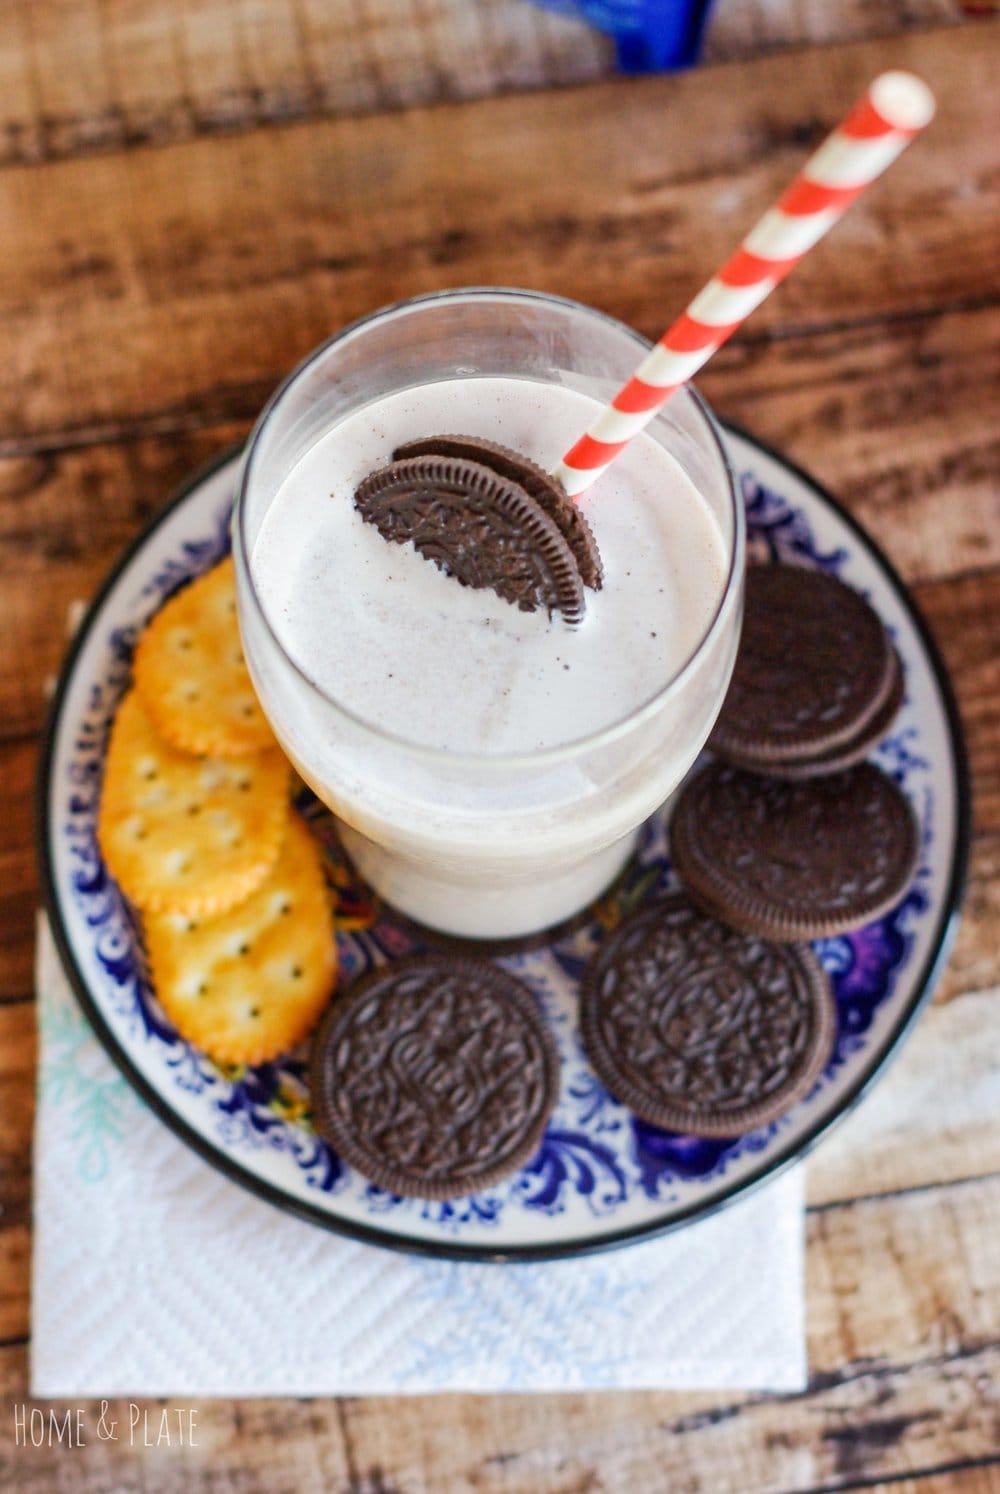 Oreo Frozen Yogurt Milkshakes   www.homeandplate.com   Surprise Santa with an Oreo milkshake made fresh with vanilla bean frozen yogurt and Oreo cookies. #ad #MerryMeals